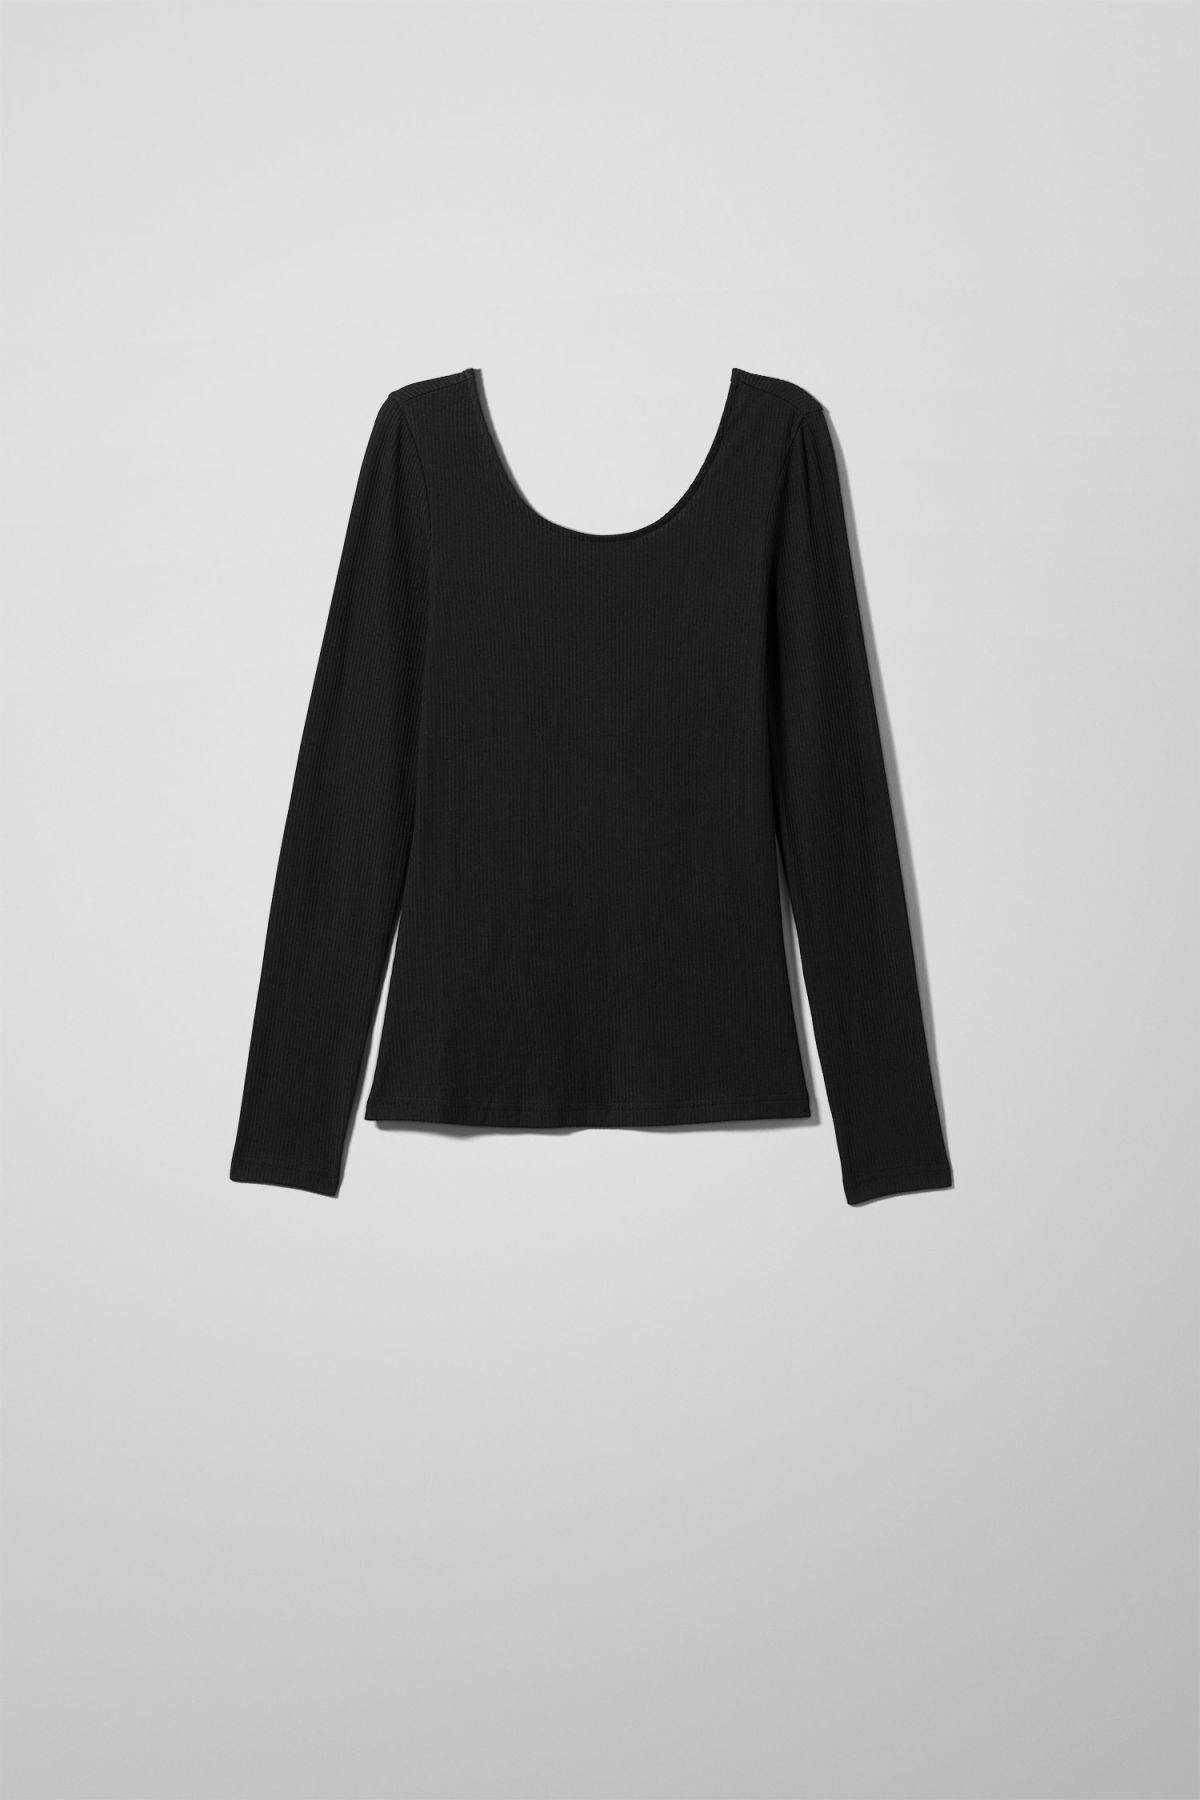 Image of Cia Long Sleeve - Black-XS